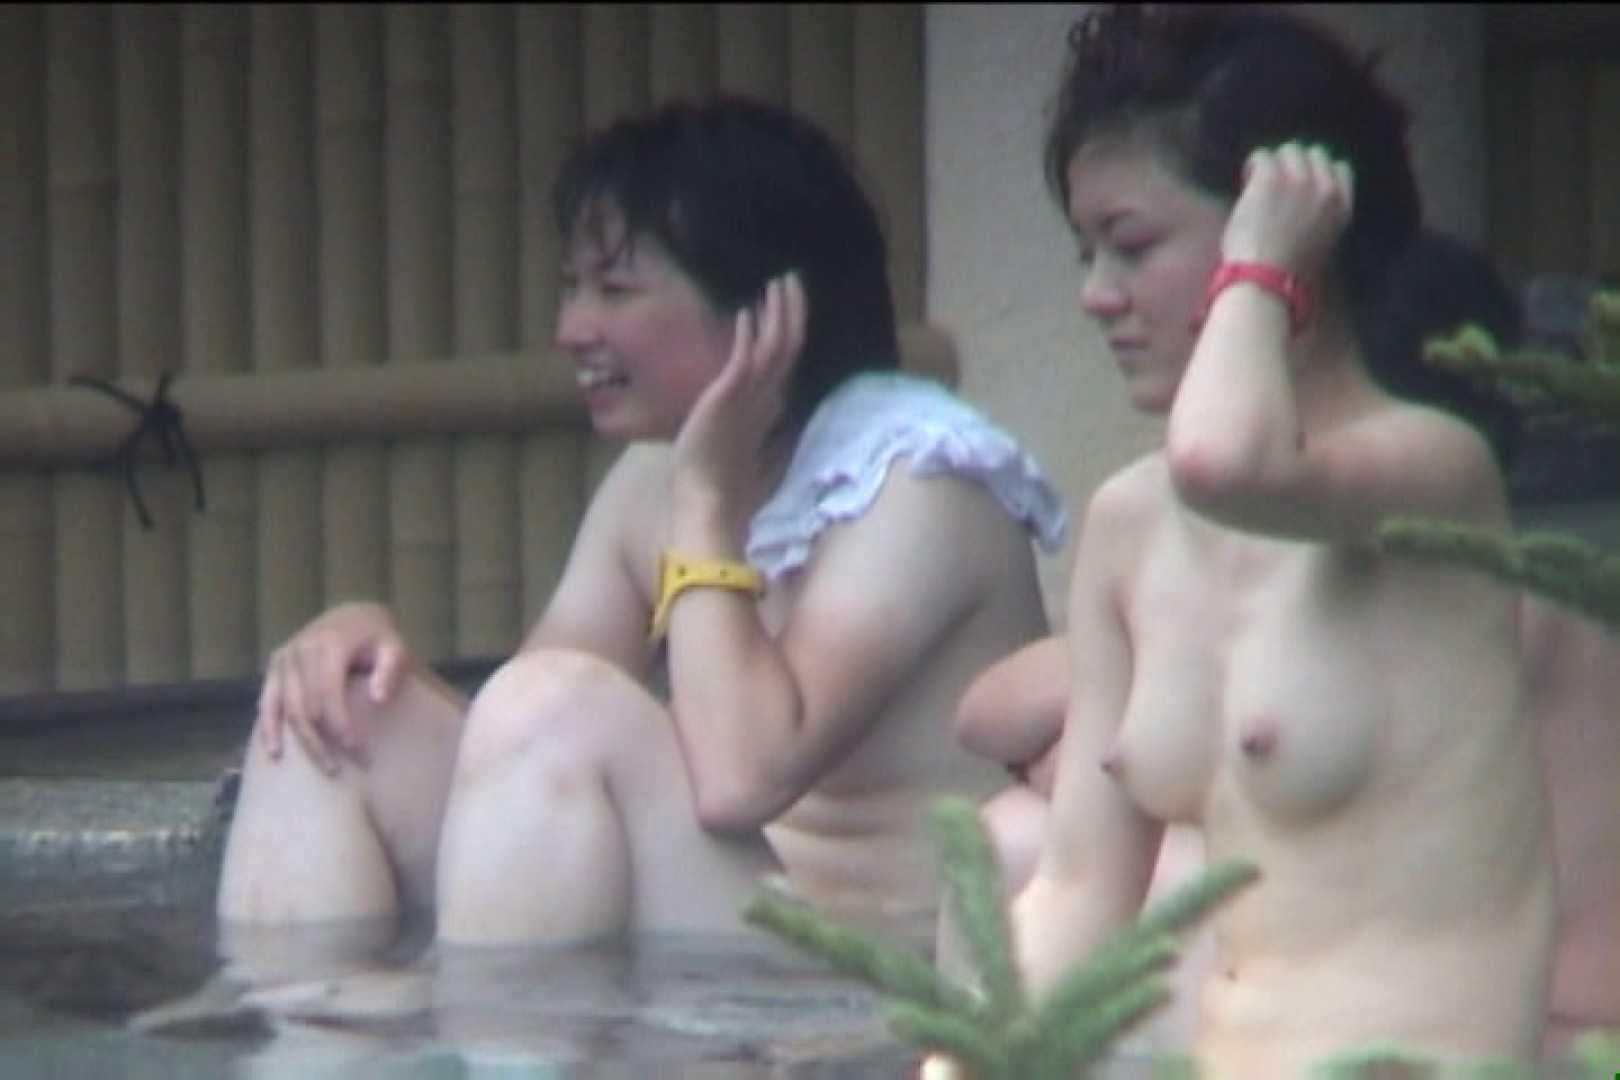 Aquaな露天風呂Vol.94【VIP限定】 OLセックス 盗撮エロ画像 79画像 23